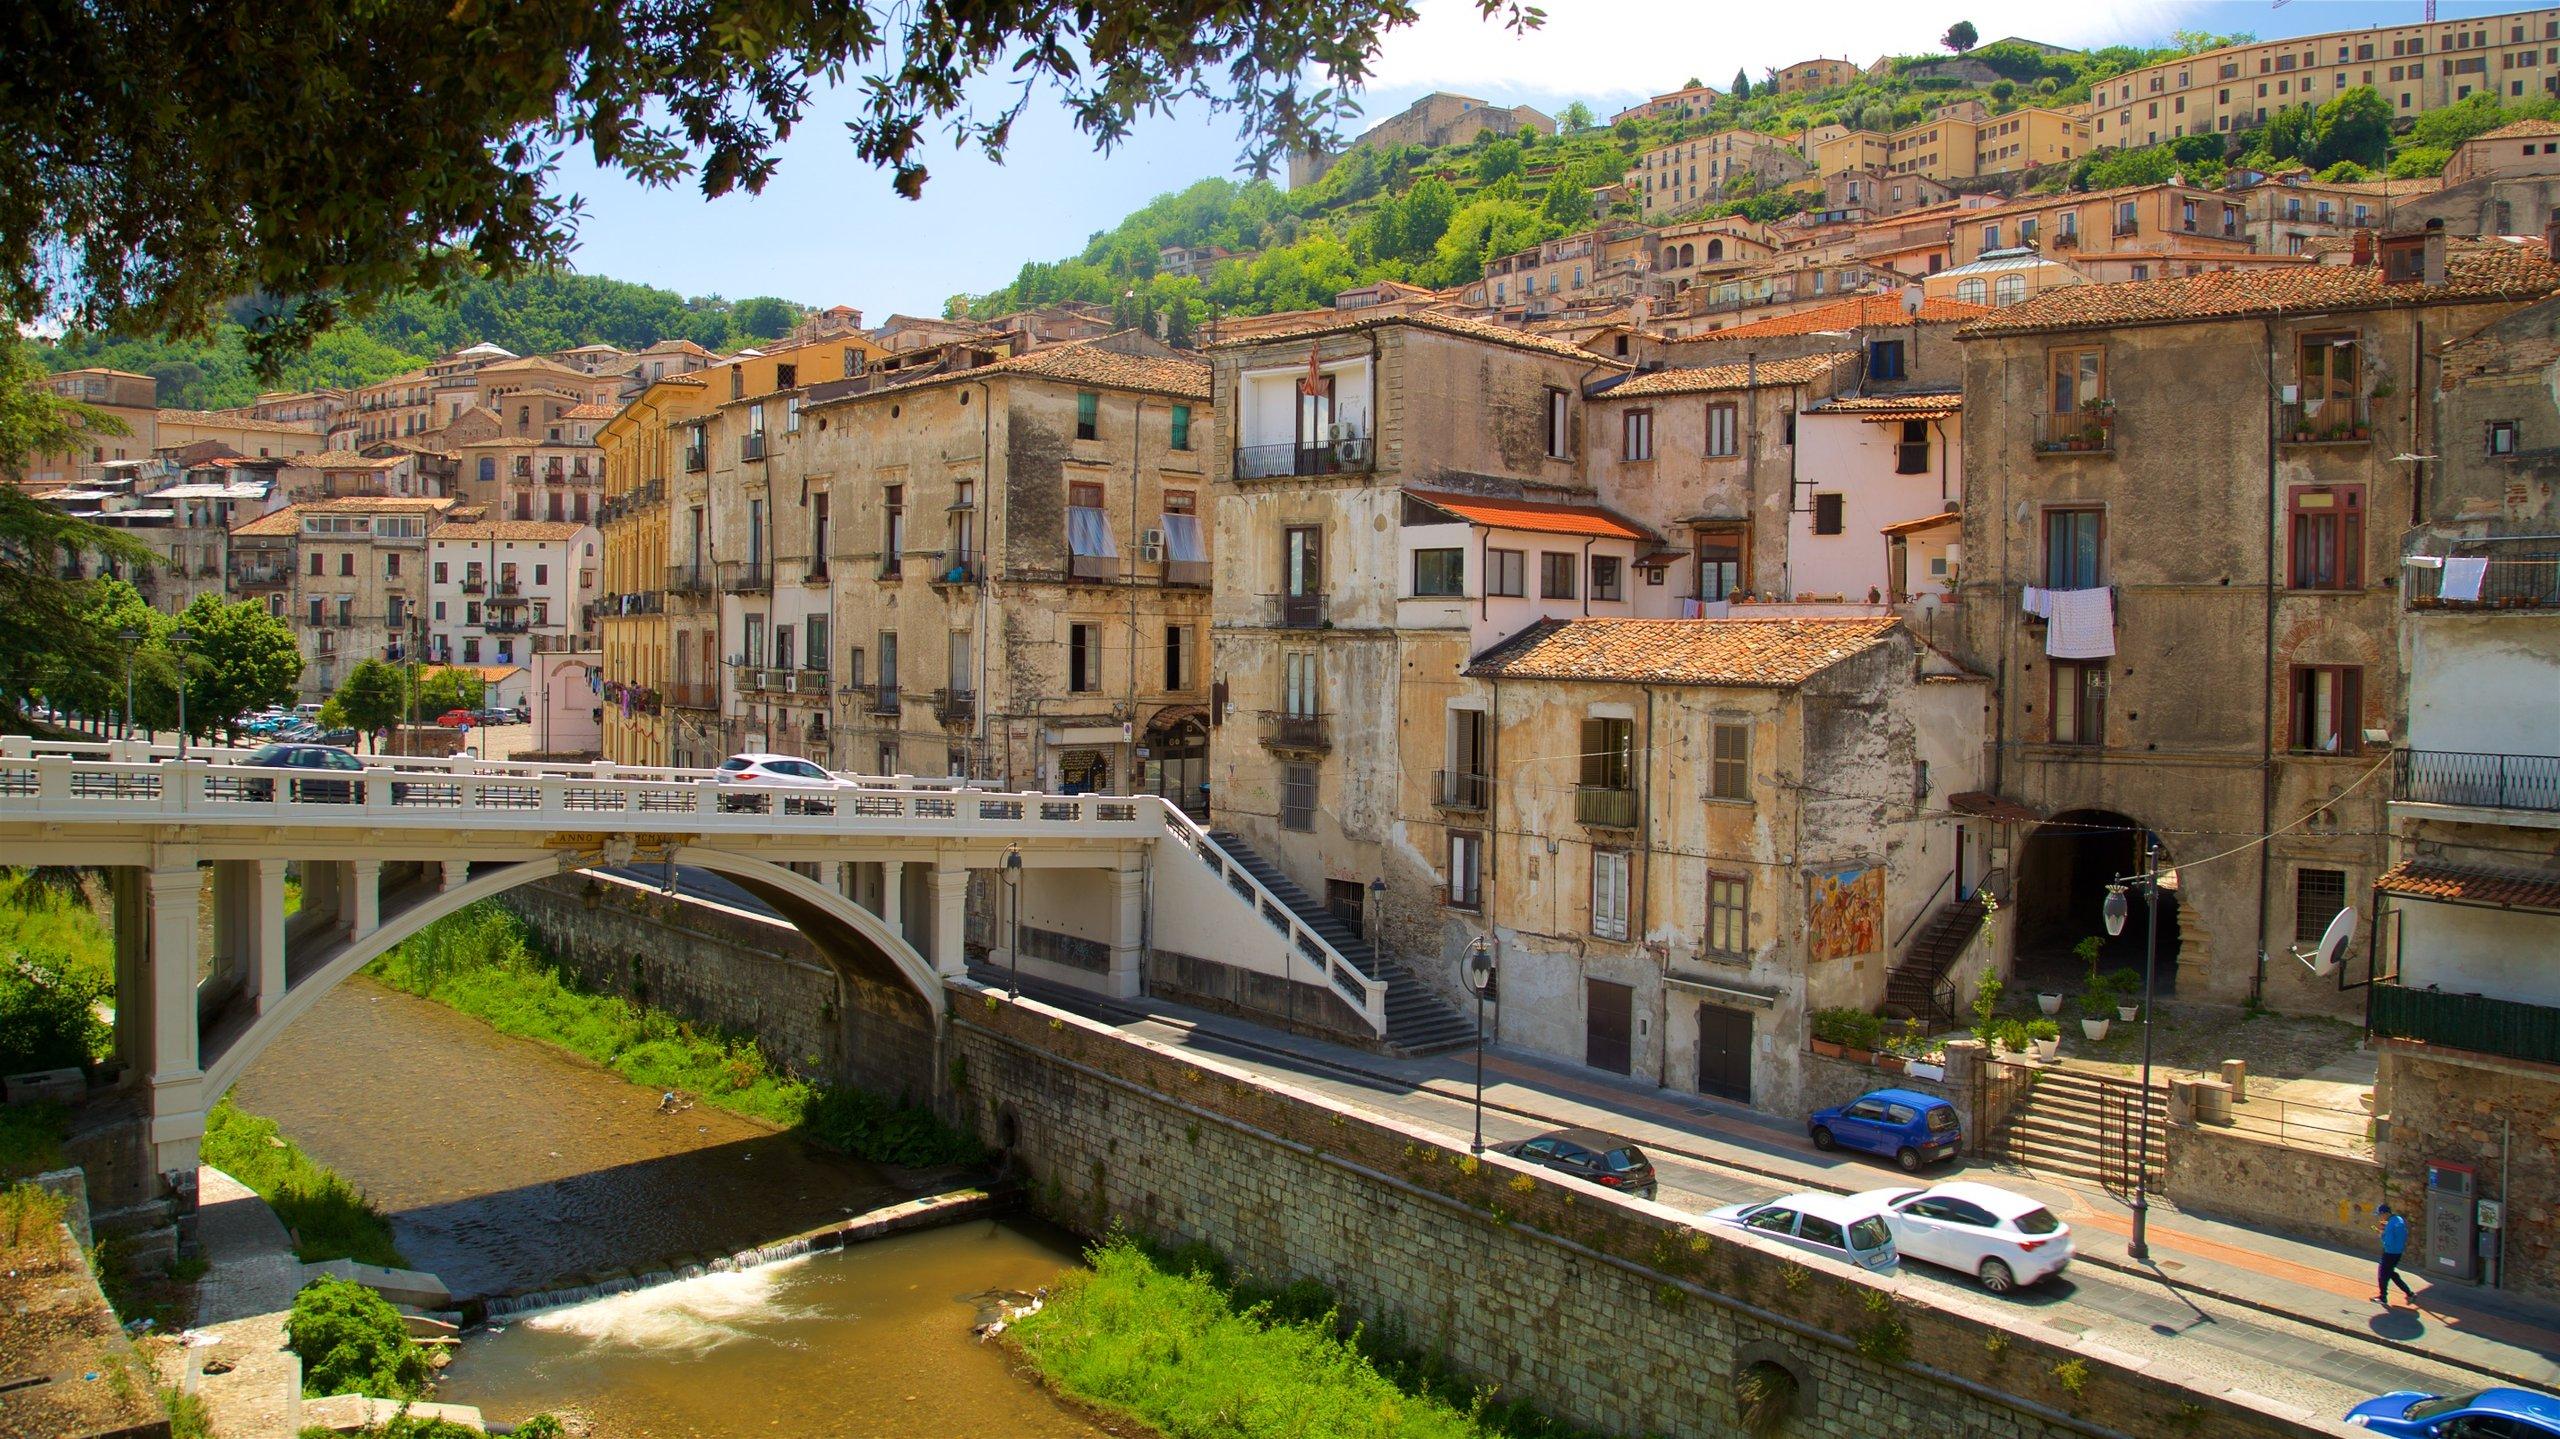 Cosenza (provincie), Calabrië, Italië